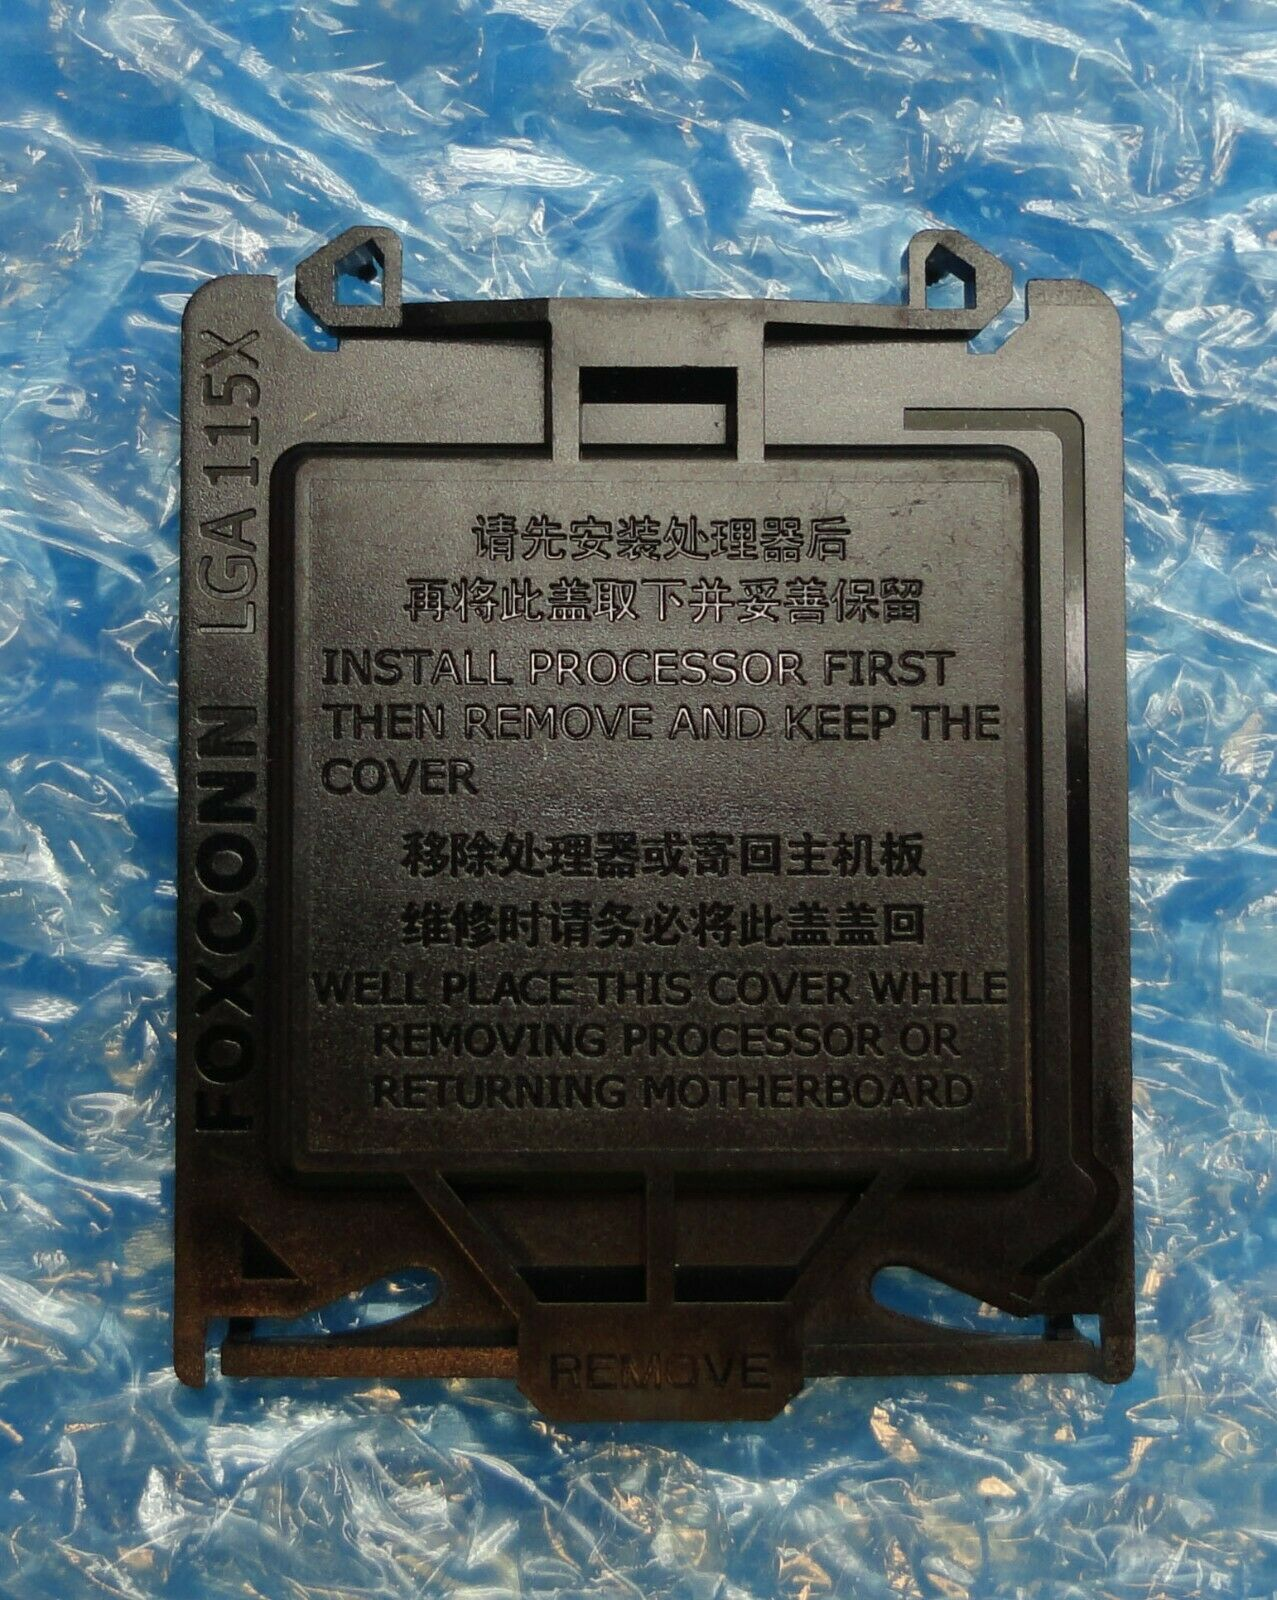 1 x Motherboard Socket LGA1150 LGA1151 LGA1155 LGA1156 Processor Cover Protector